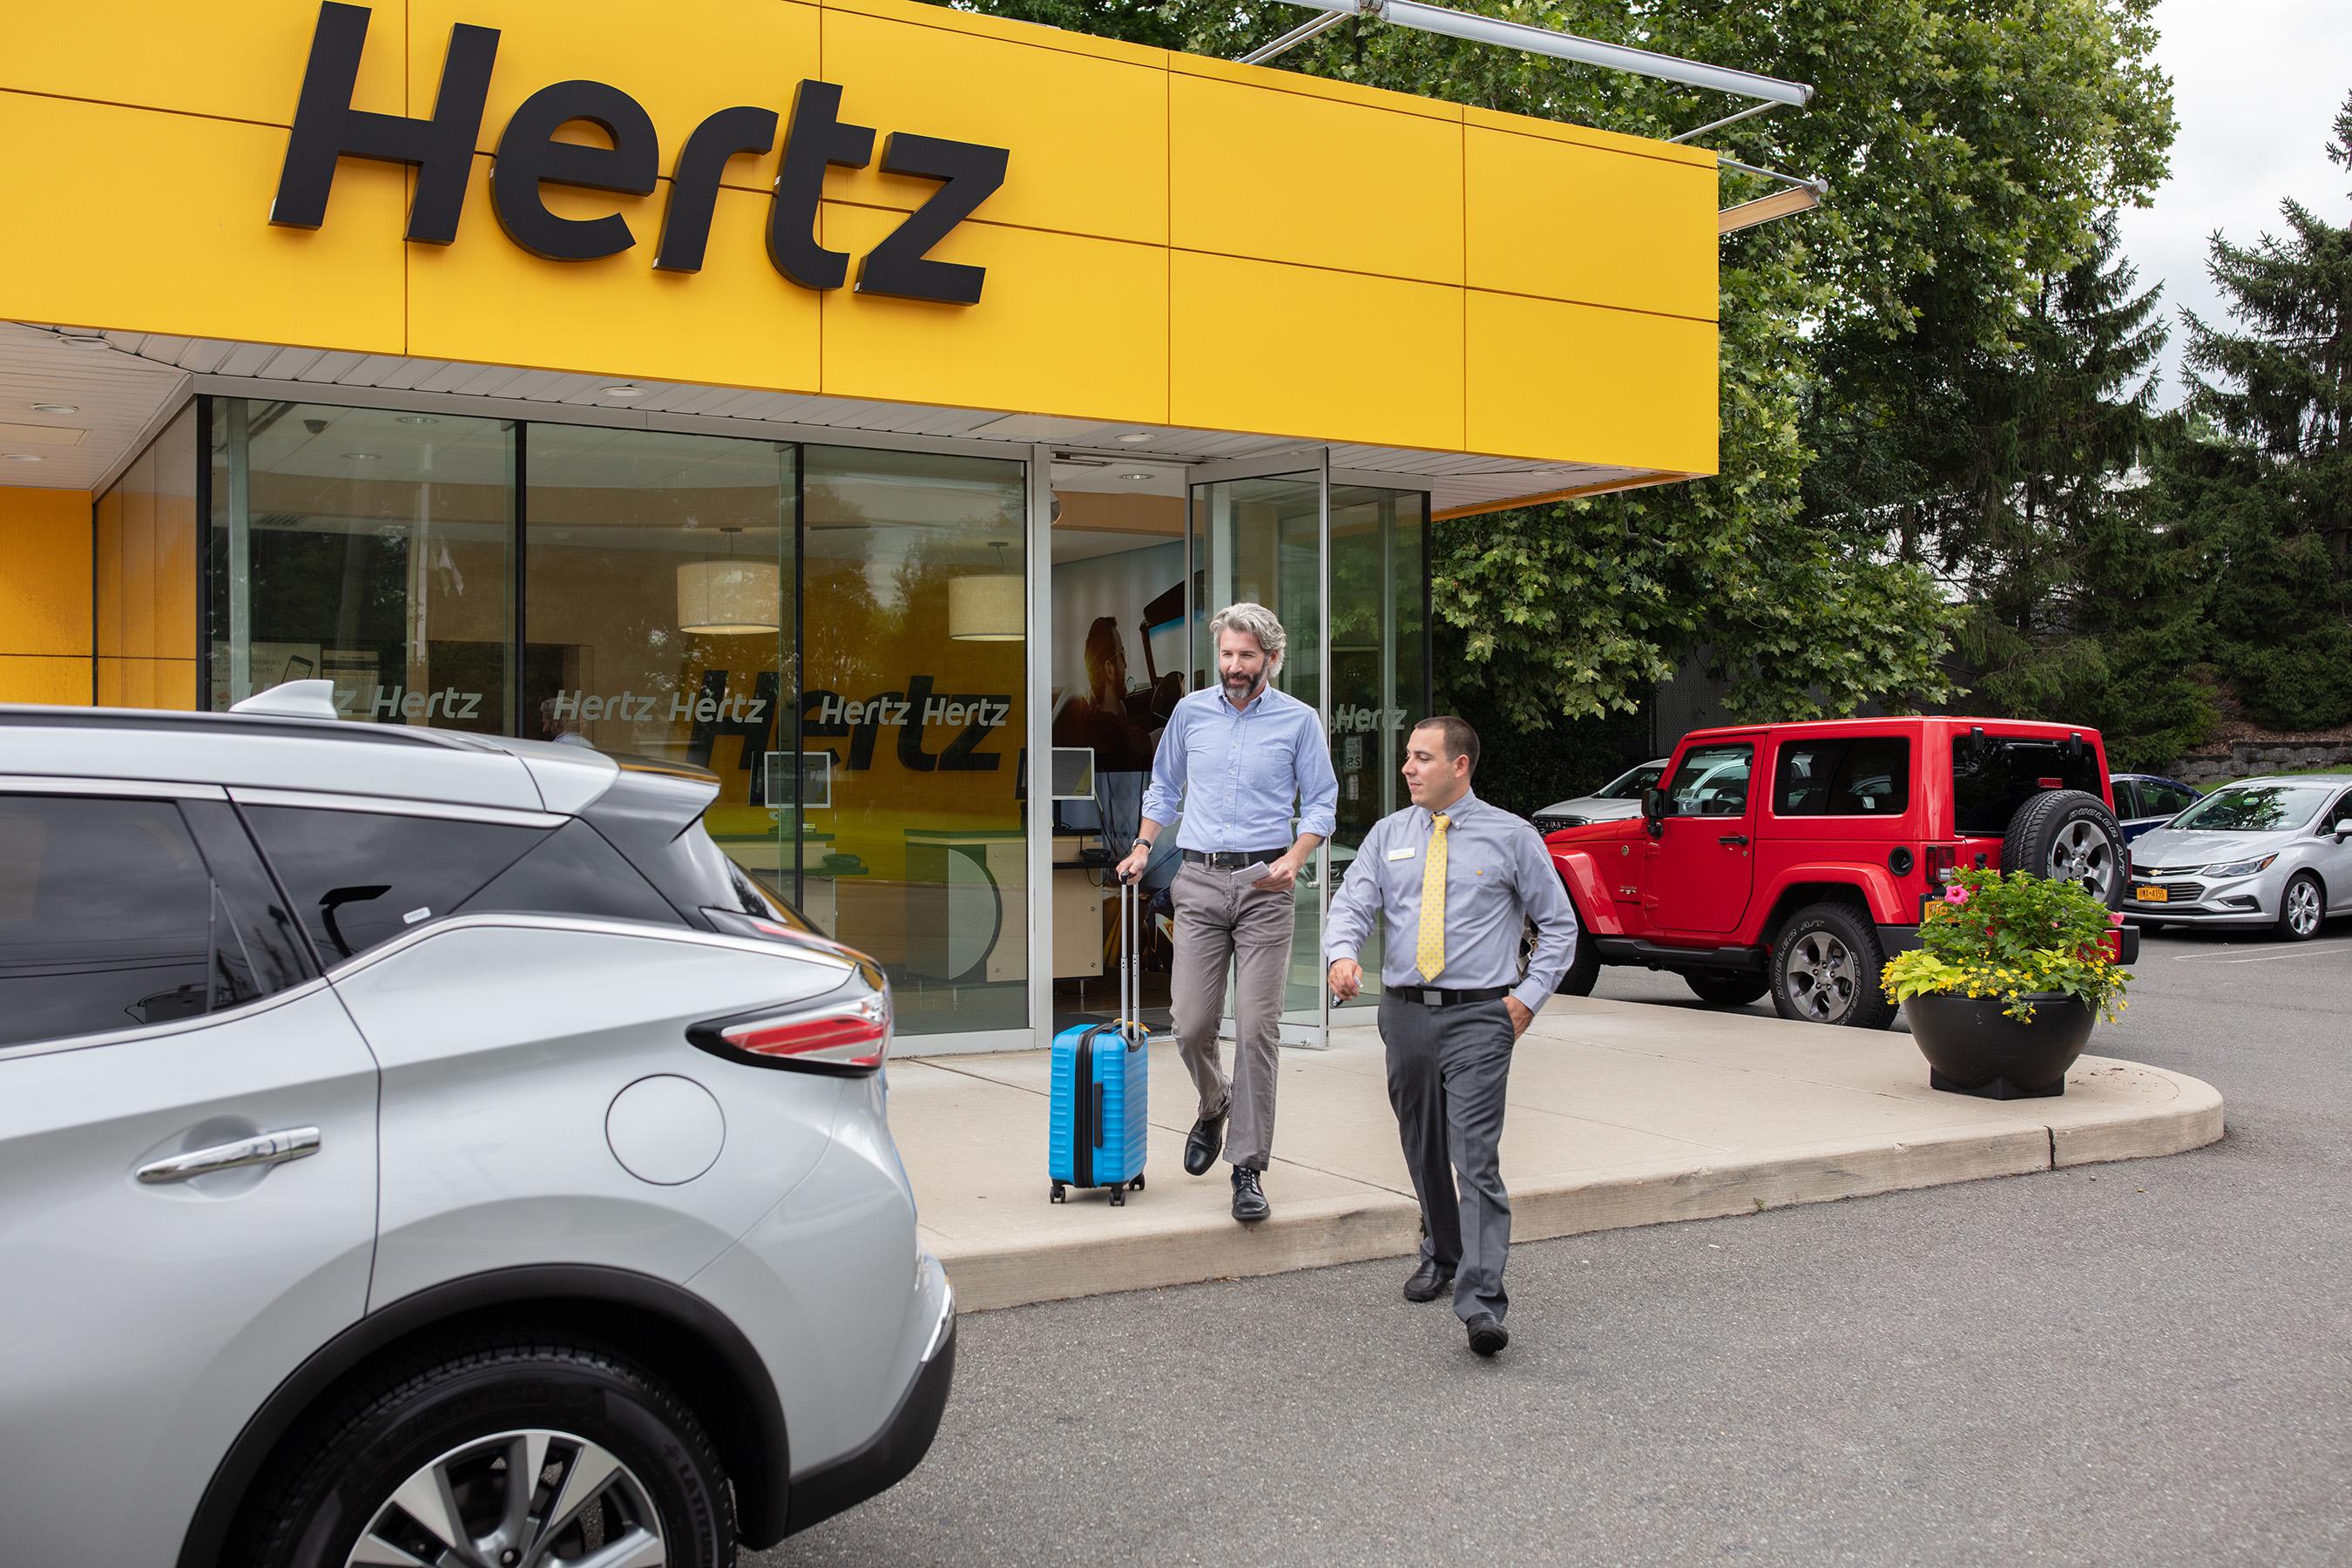 Hertz Location Exterior